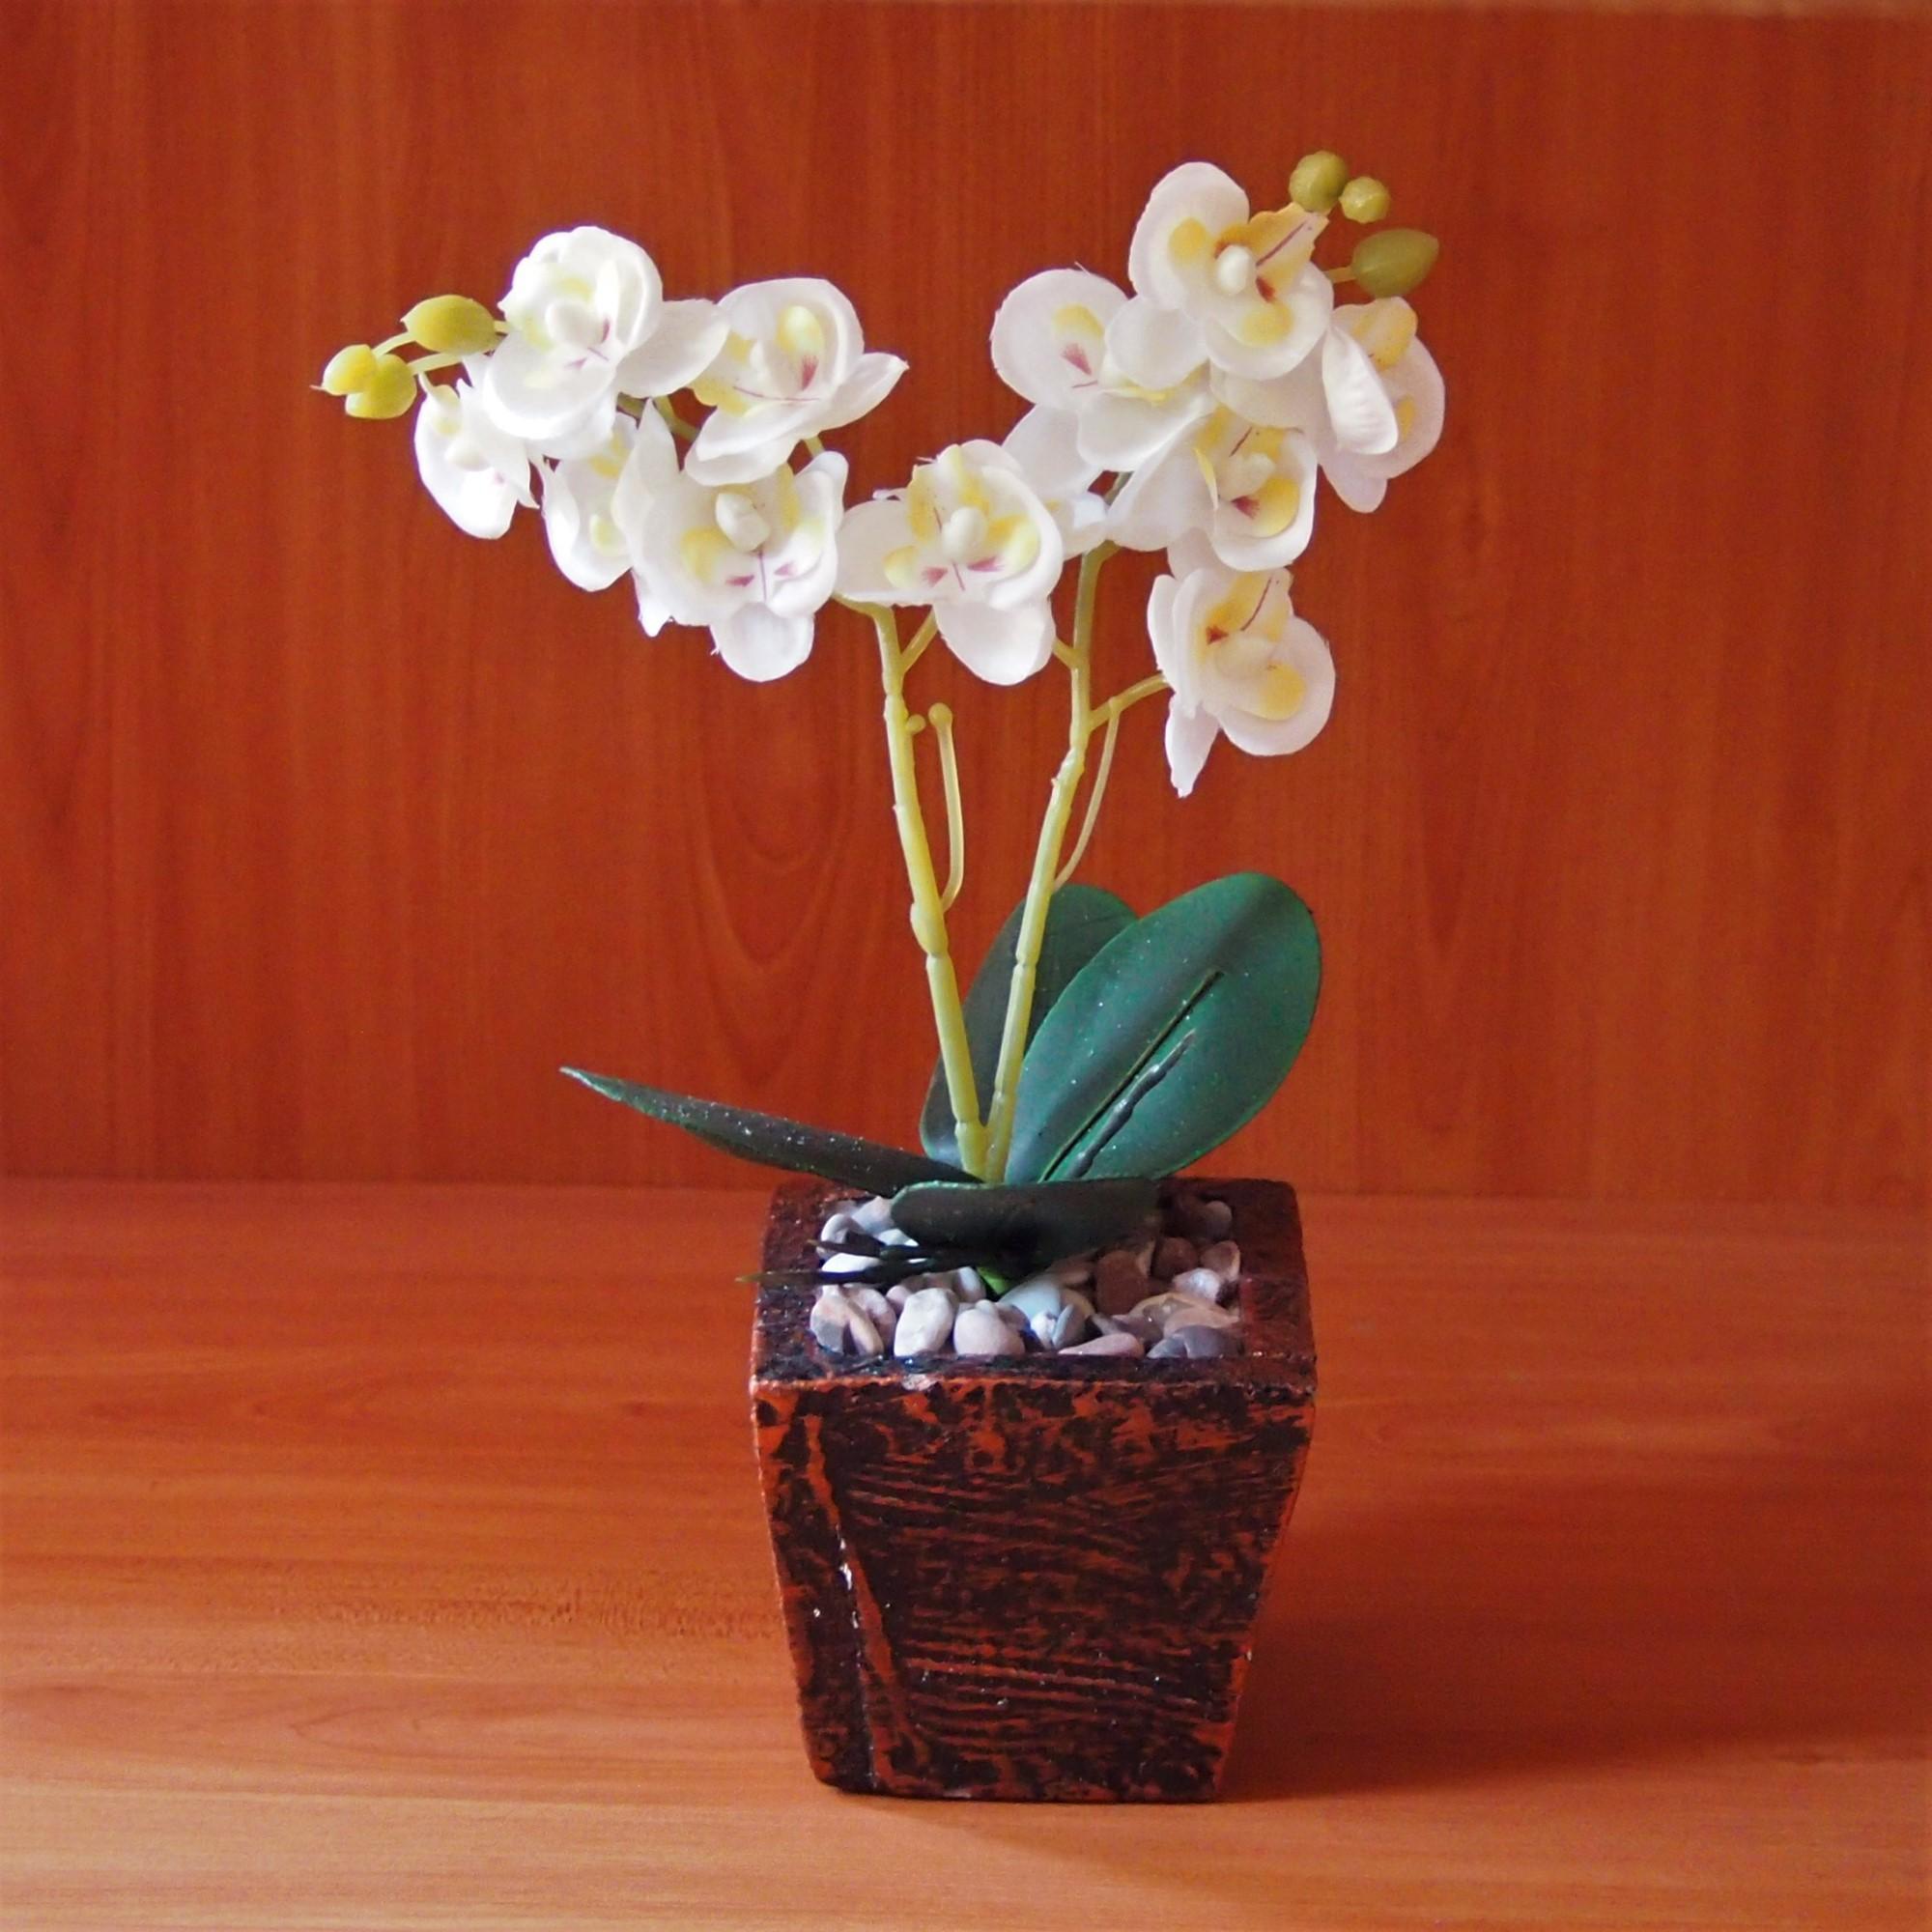 Bunga Dekorasi Dan Pajangan - Bunga Anggrek New Hiasan Plastik Bunga  Artificial e3513f6363